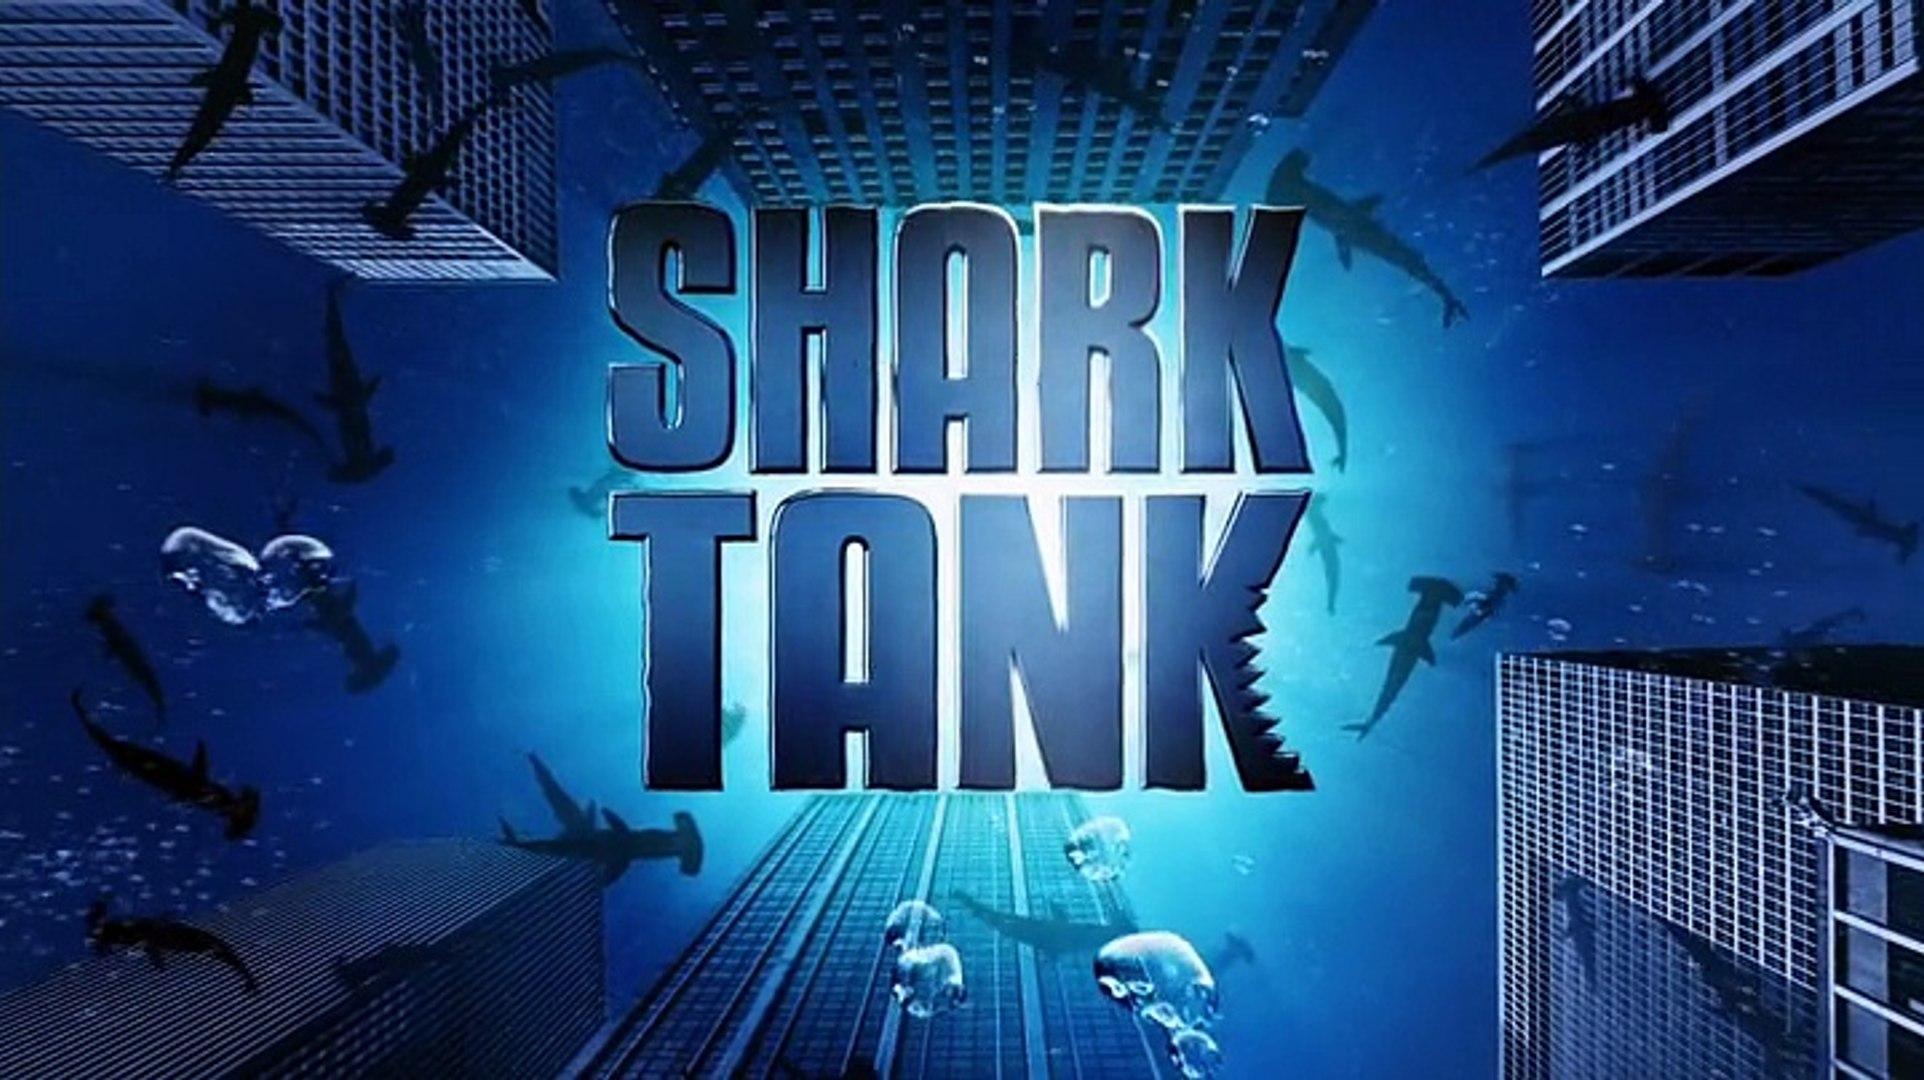 Shark Tank S07E24 HDTV